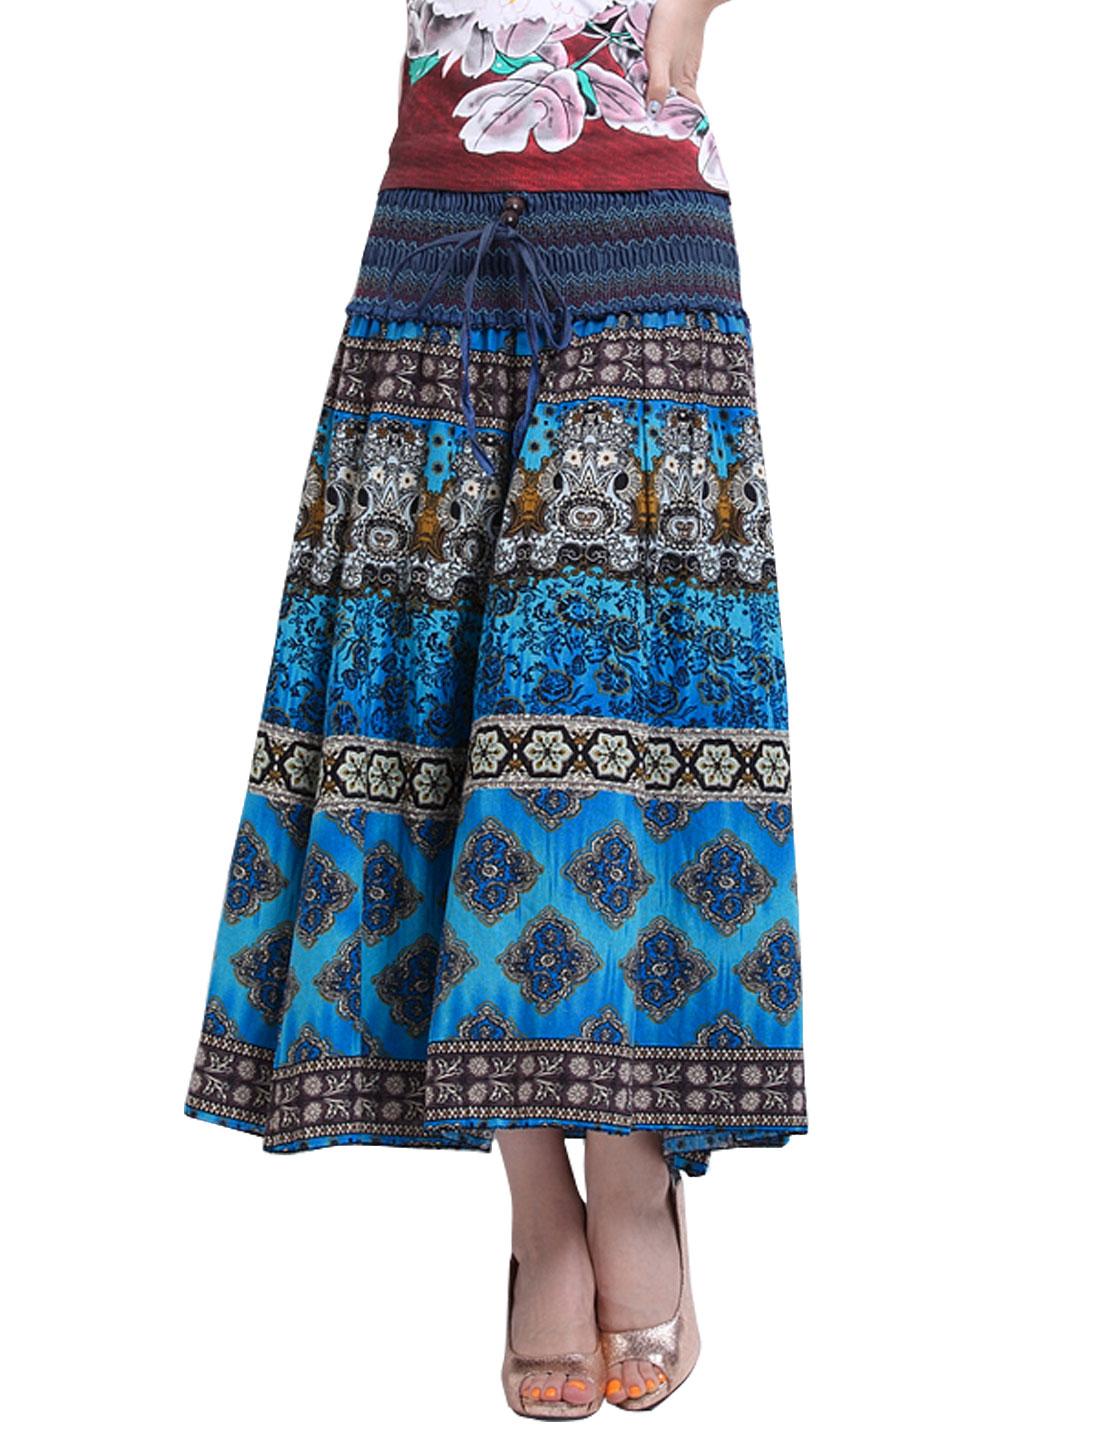 Women Smocked Waist Self Tie Decor Novelty Prints Boho Skirt Blue S